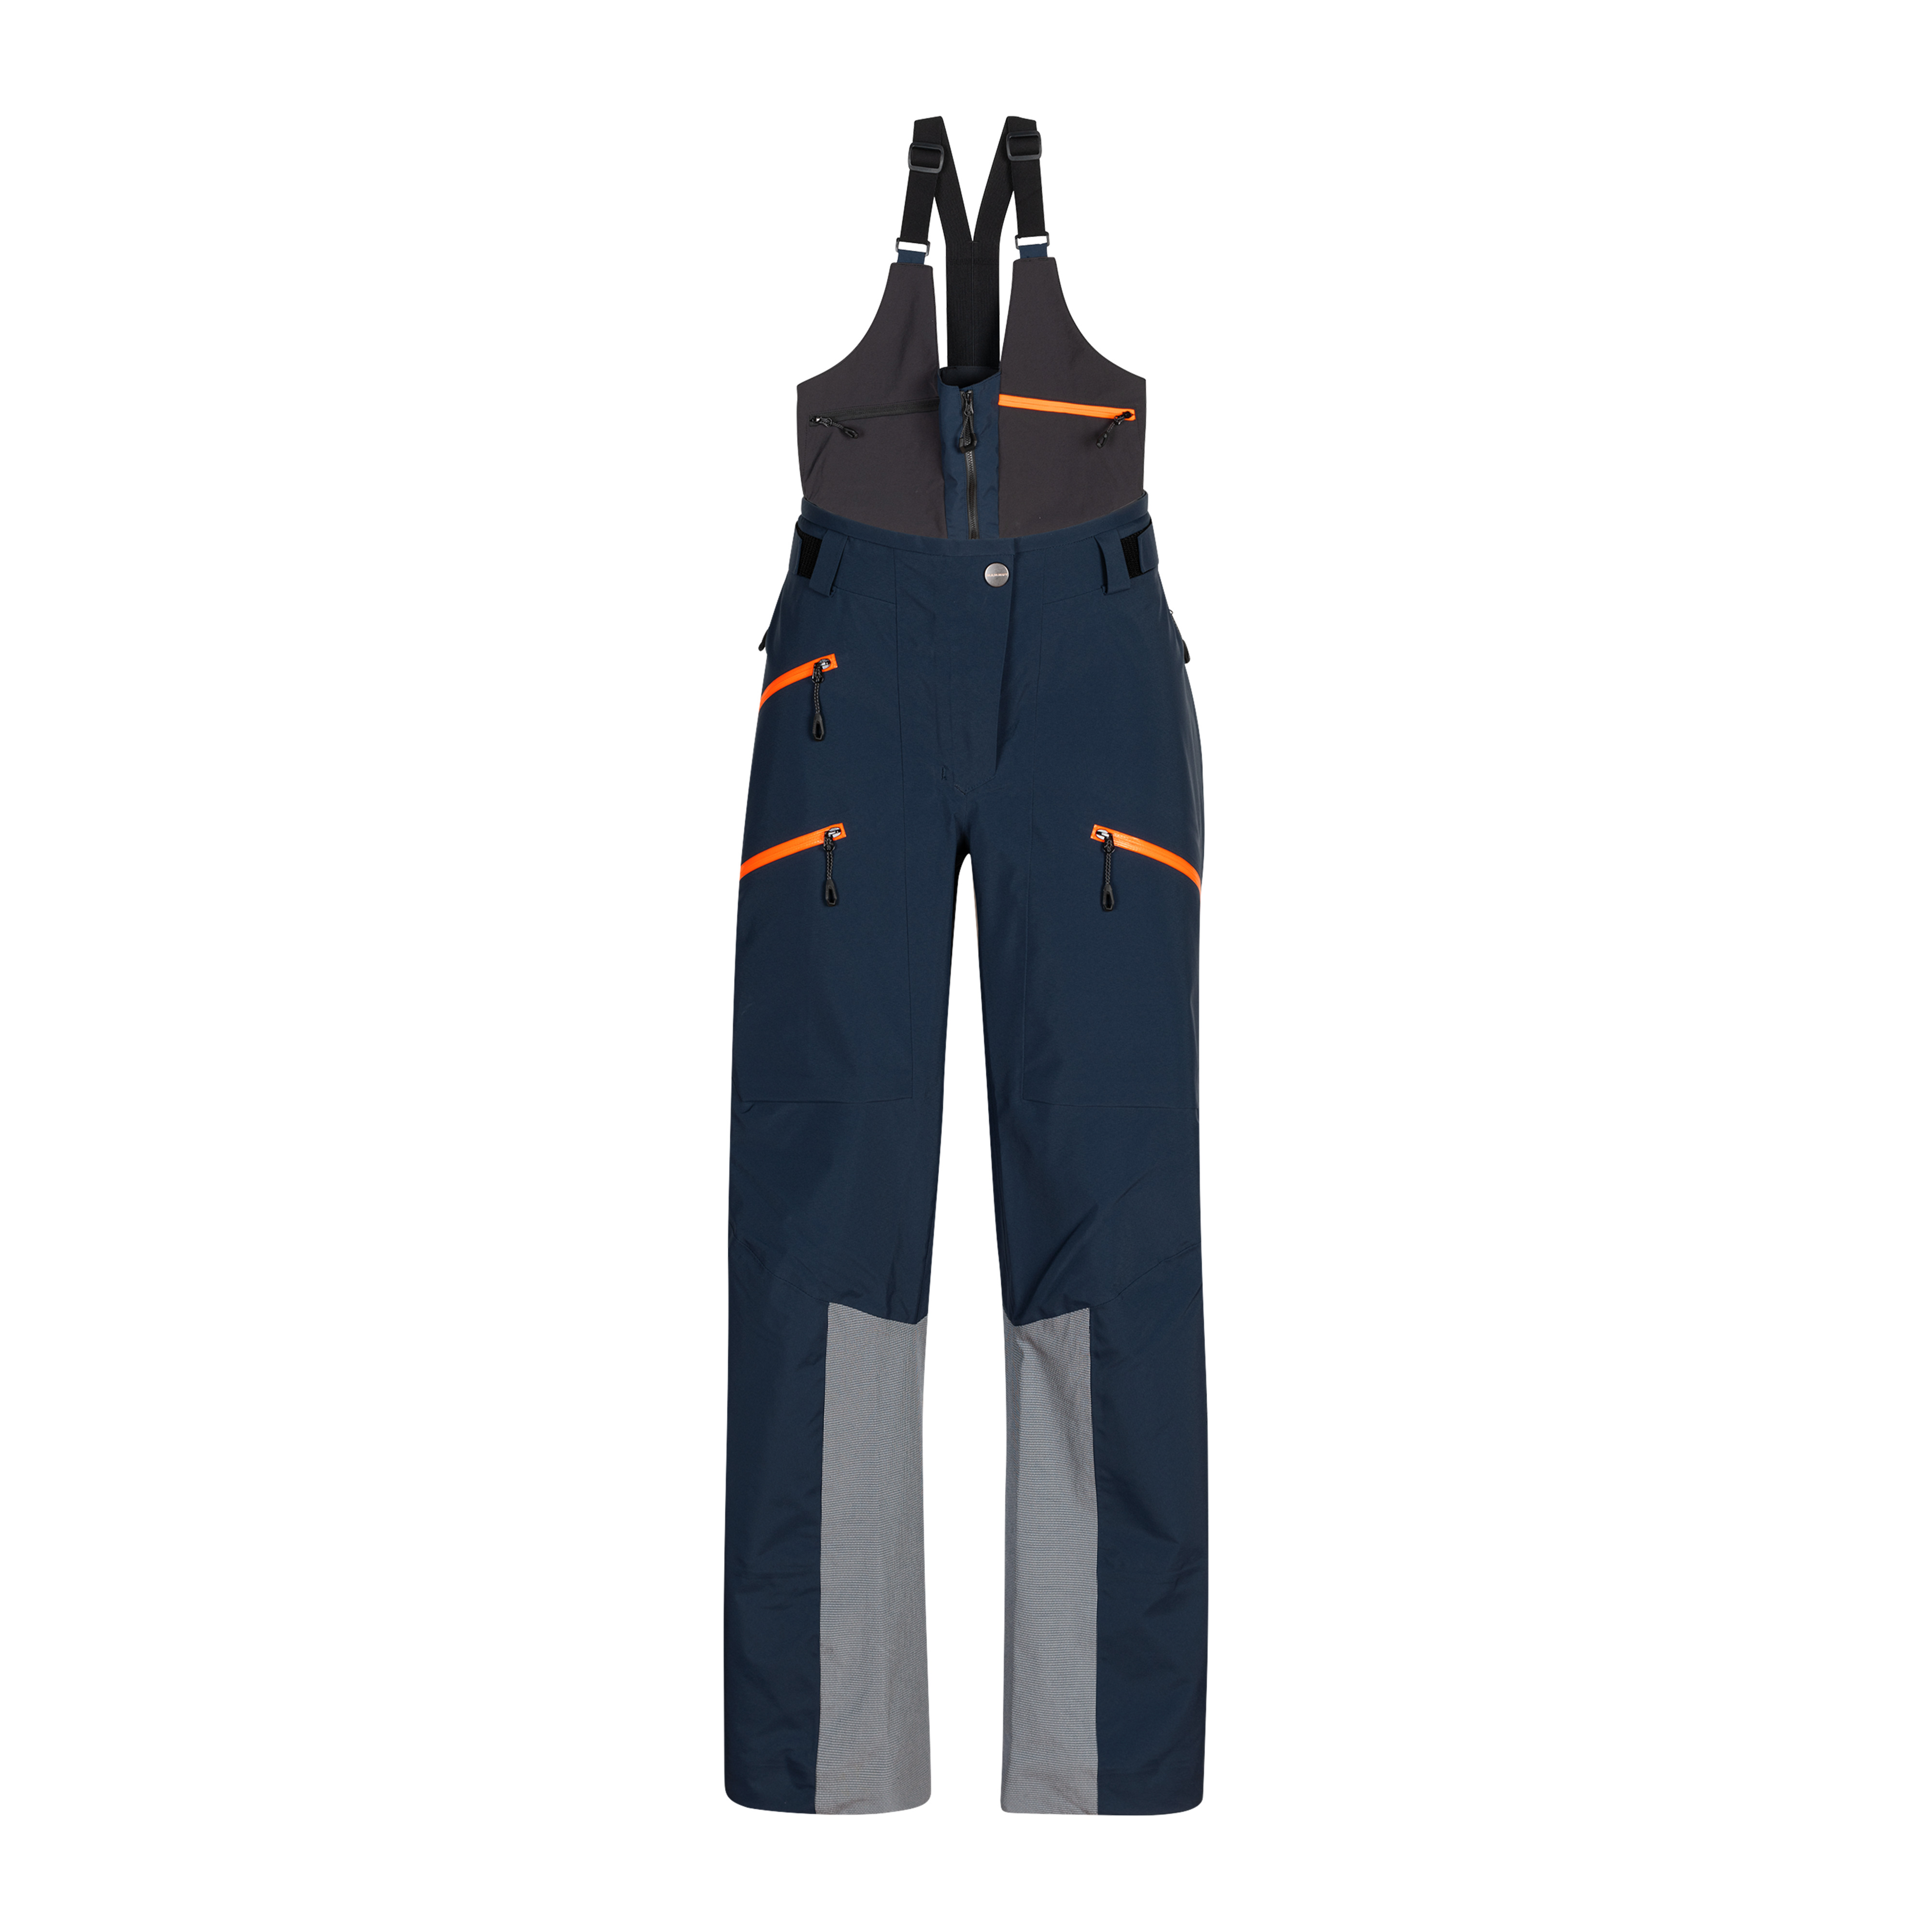 La Liste Pro HS Bib Pants Women - marine, normal, UK 20 thumbnail